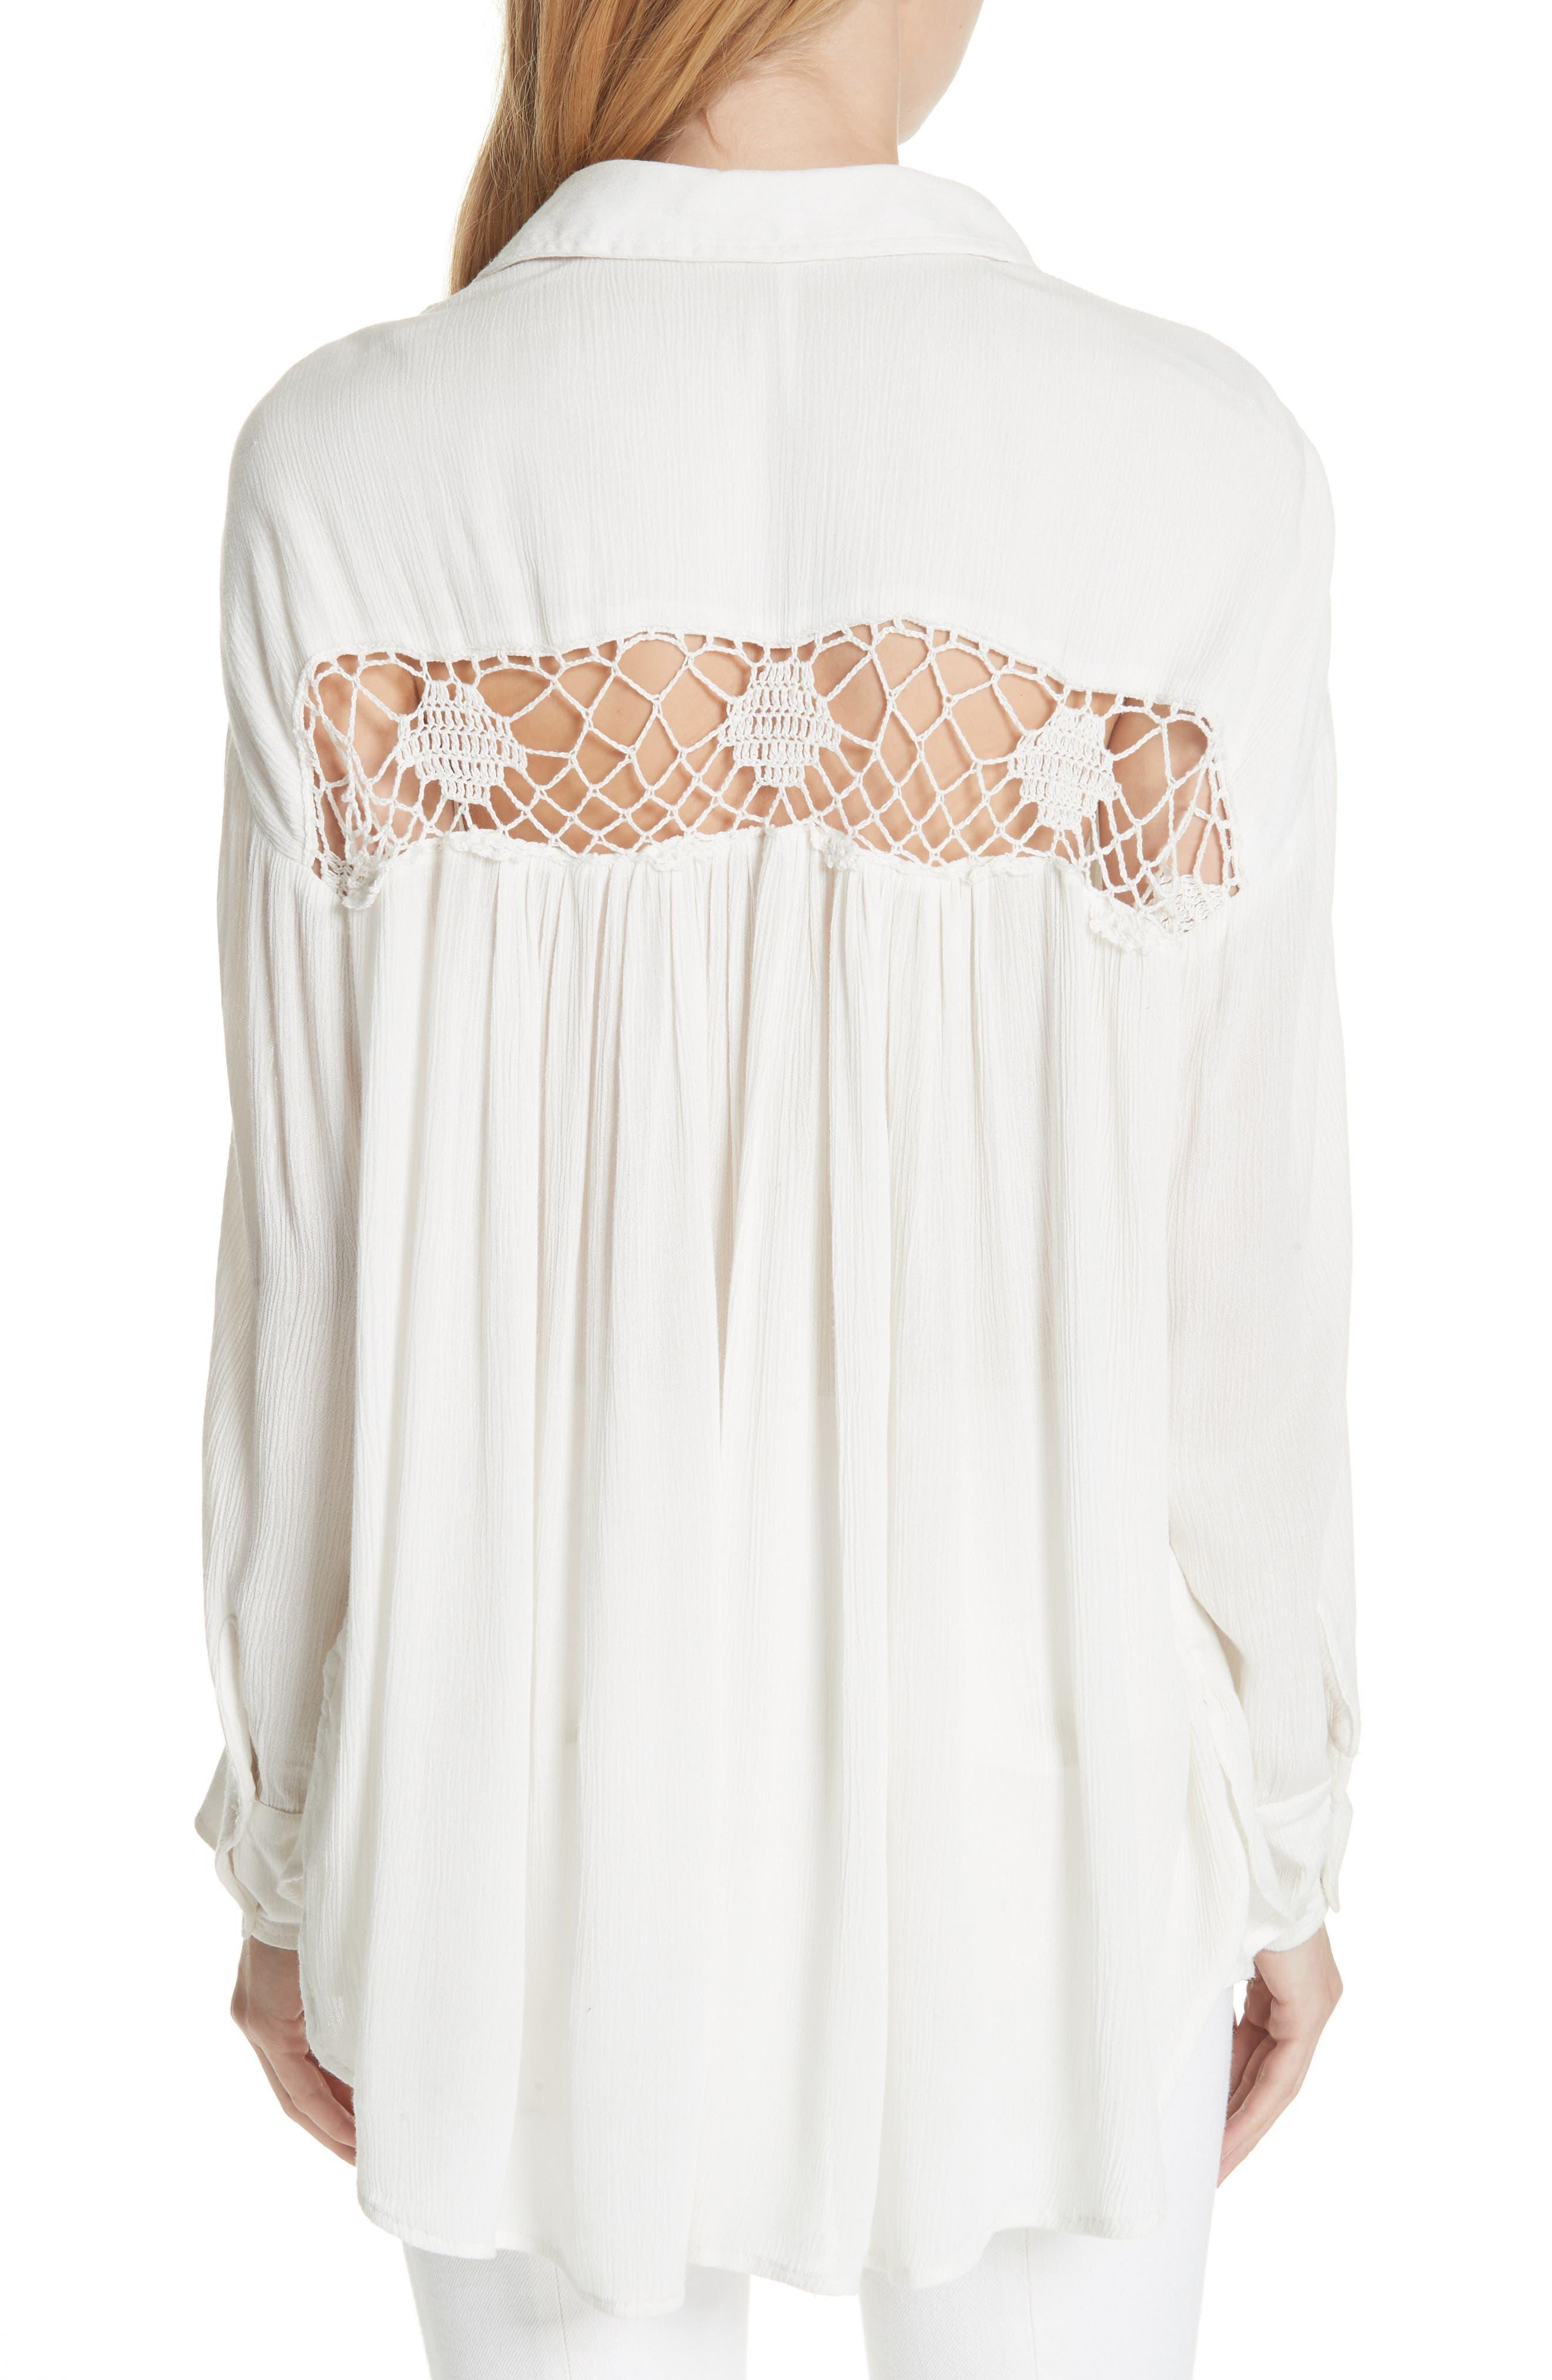 Katie Bird Crochet Inset Shirt,                             Alternate thumbnail 6, color,